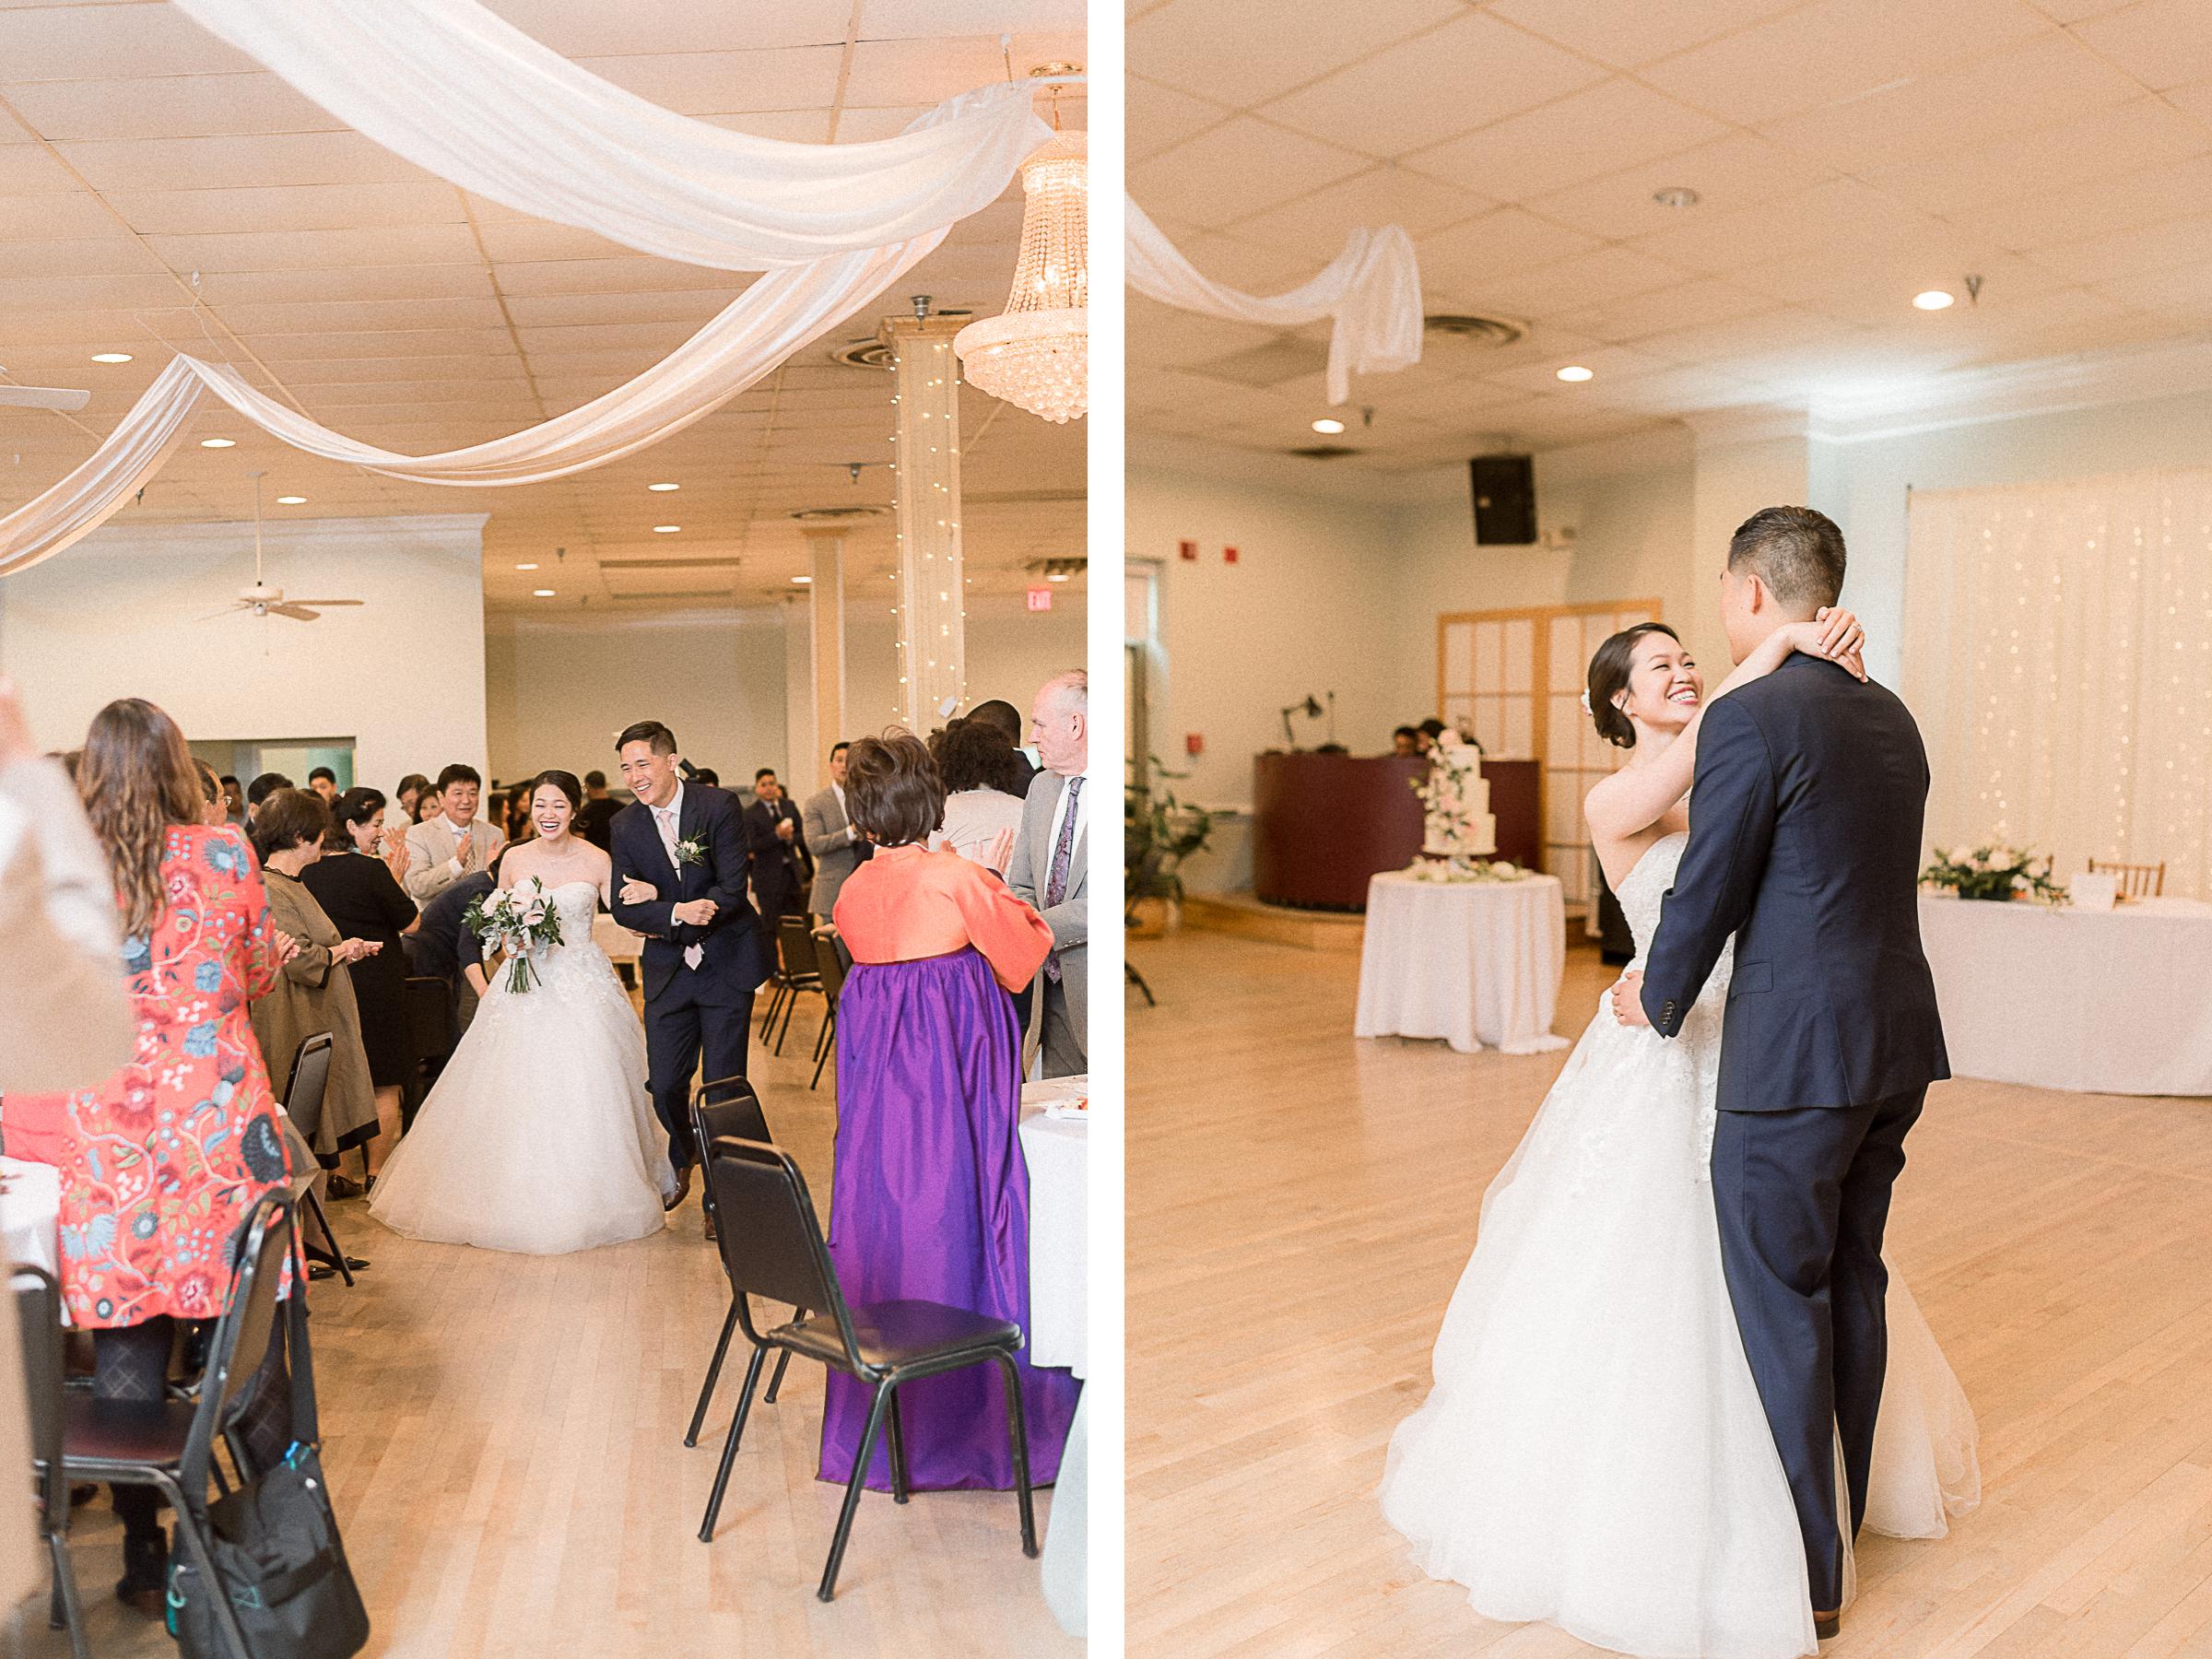 MD-Wedding-Columbia-Inn-Hollywood-Ballroom-Bridal-Party-63.jpg